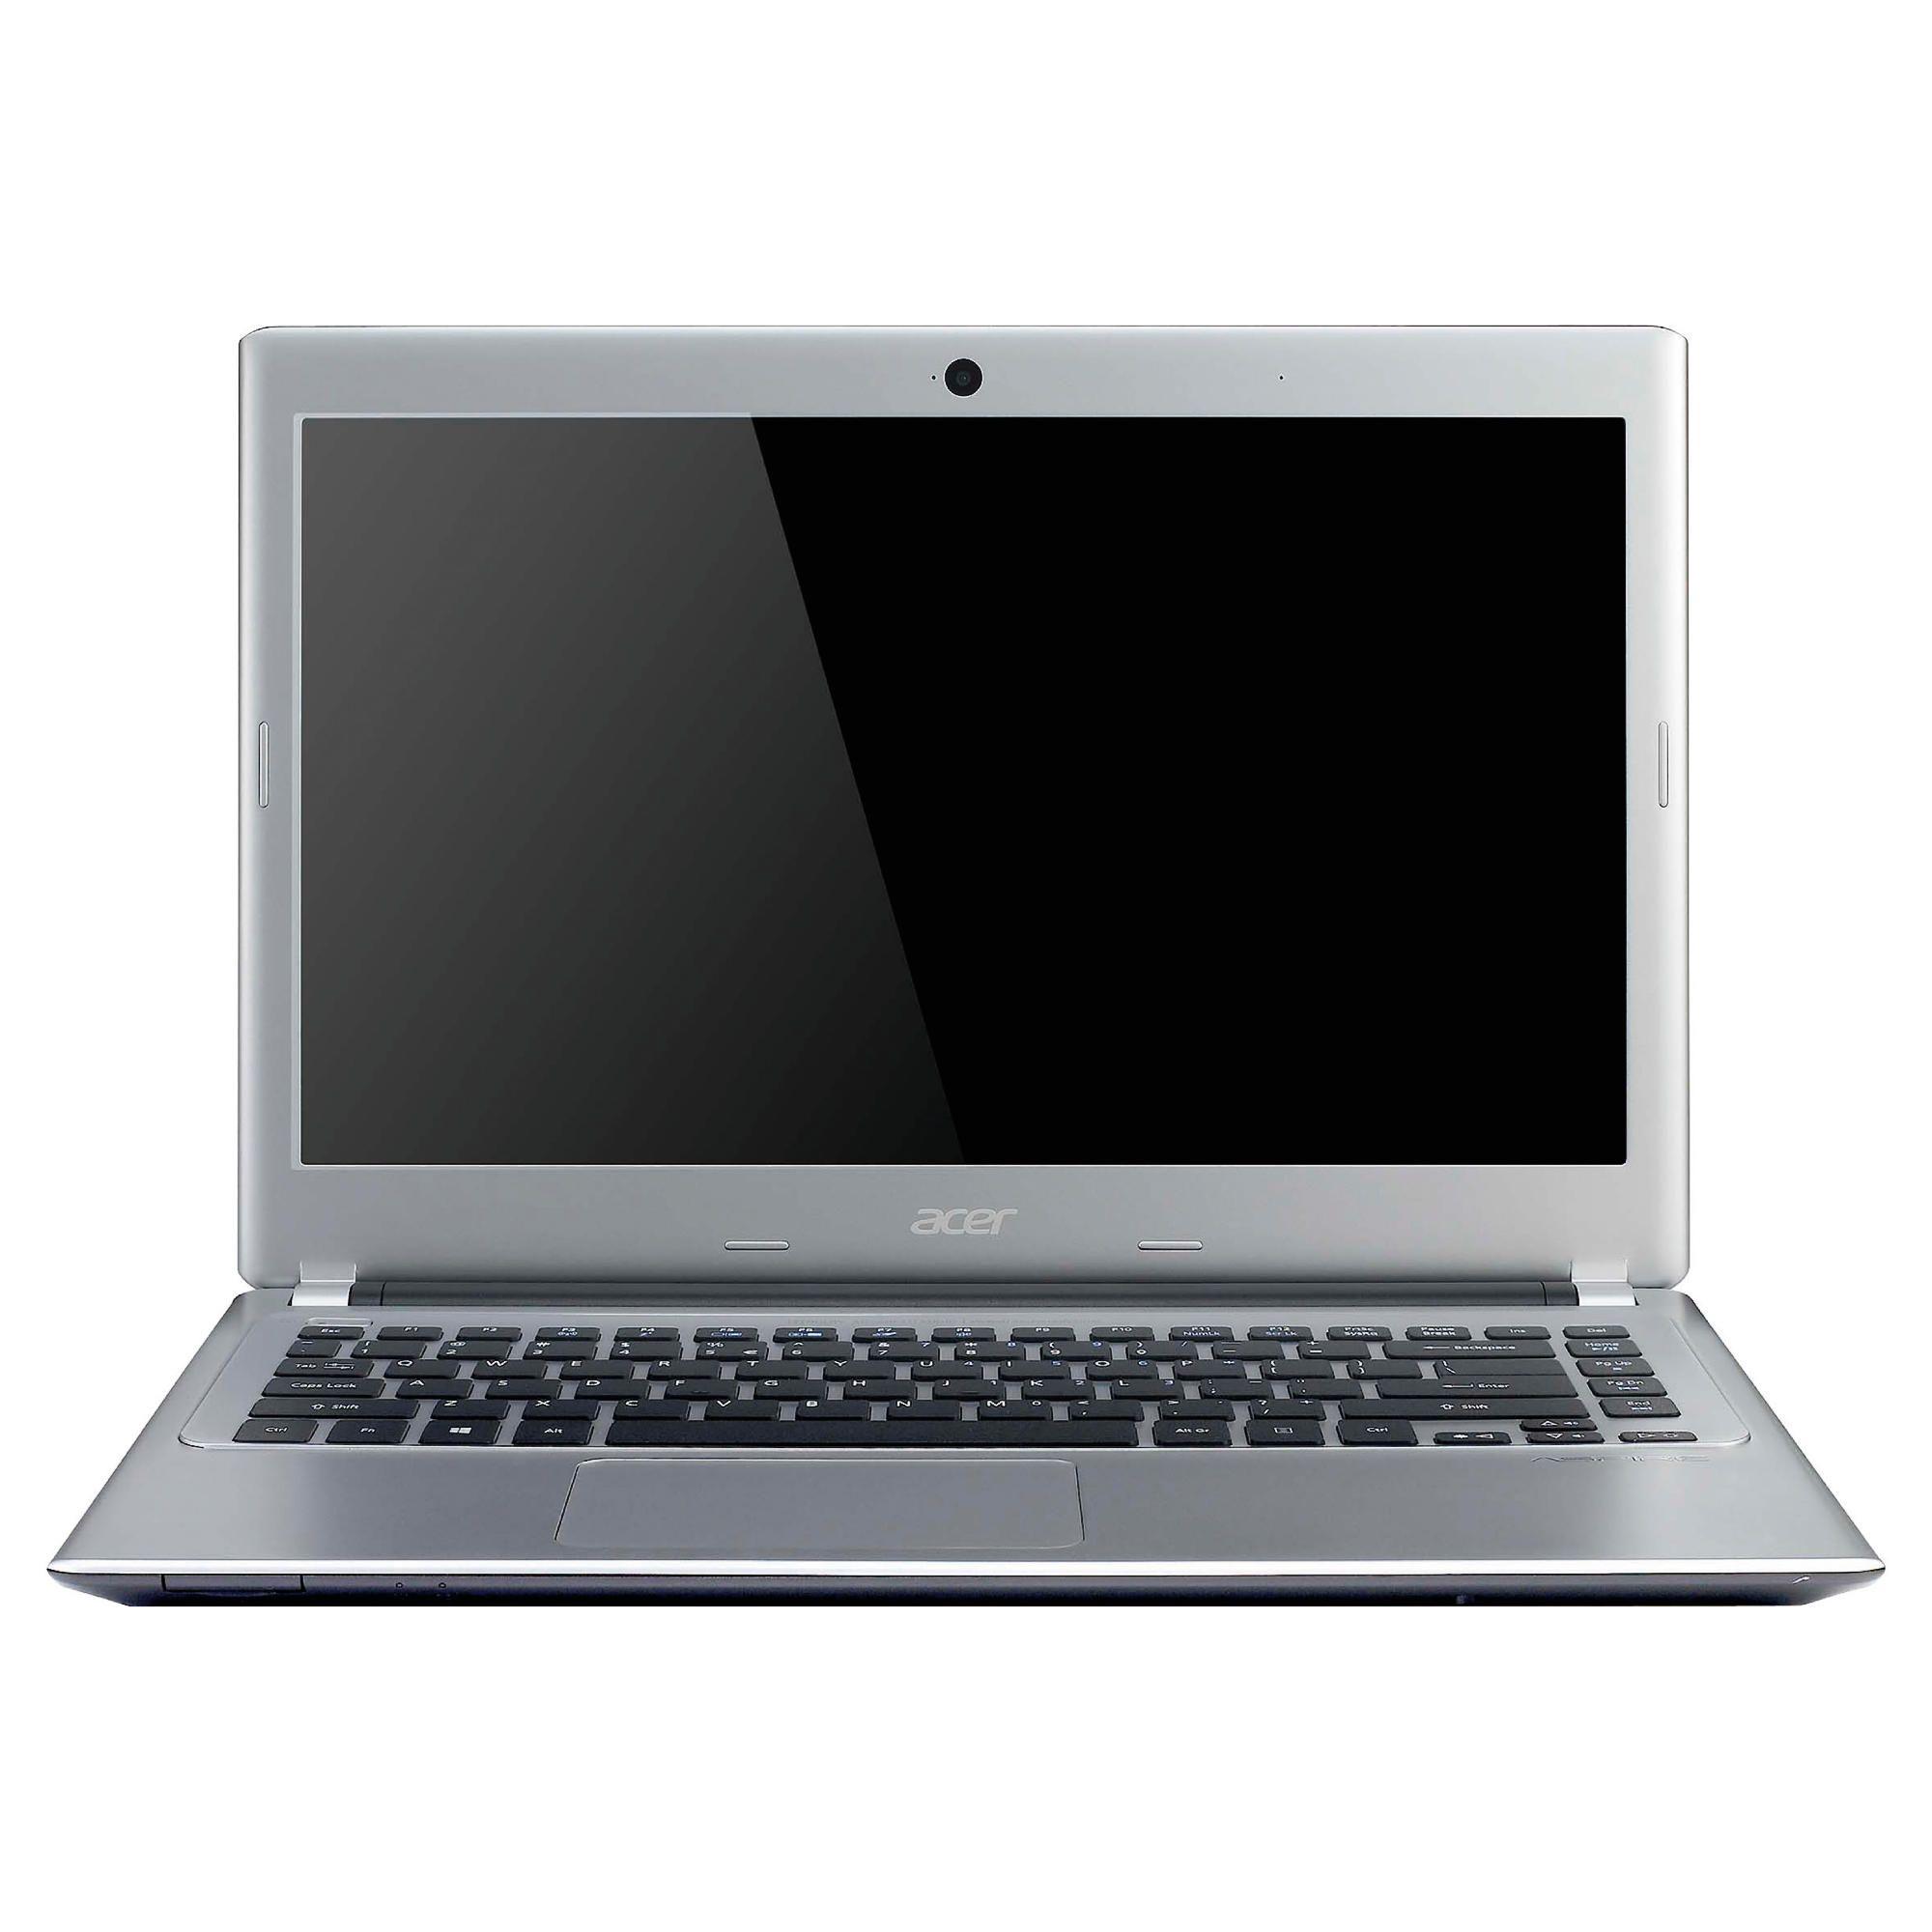 Acer V5 471 Intel Ci3-2365 6GB 500GB 14'' Win 8, Silver at Tescos Direct